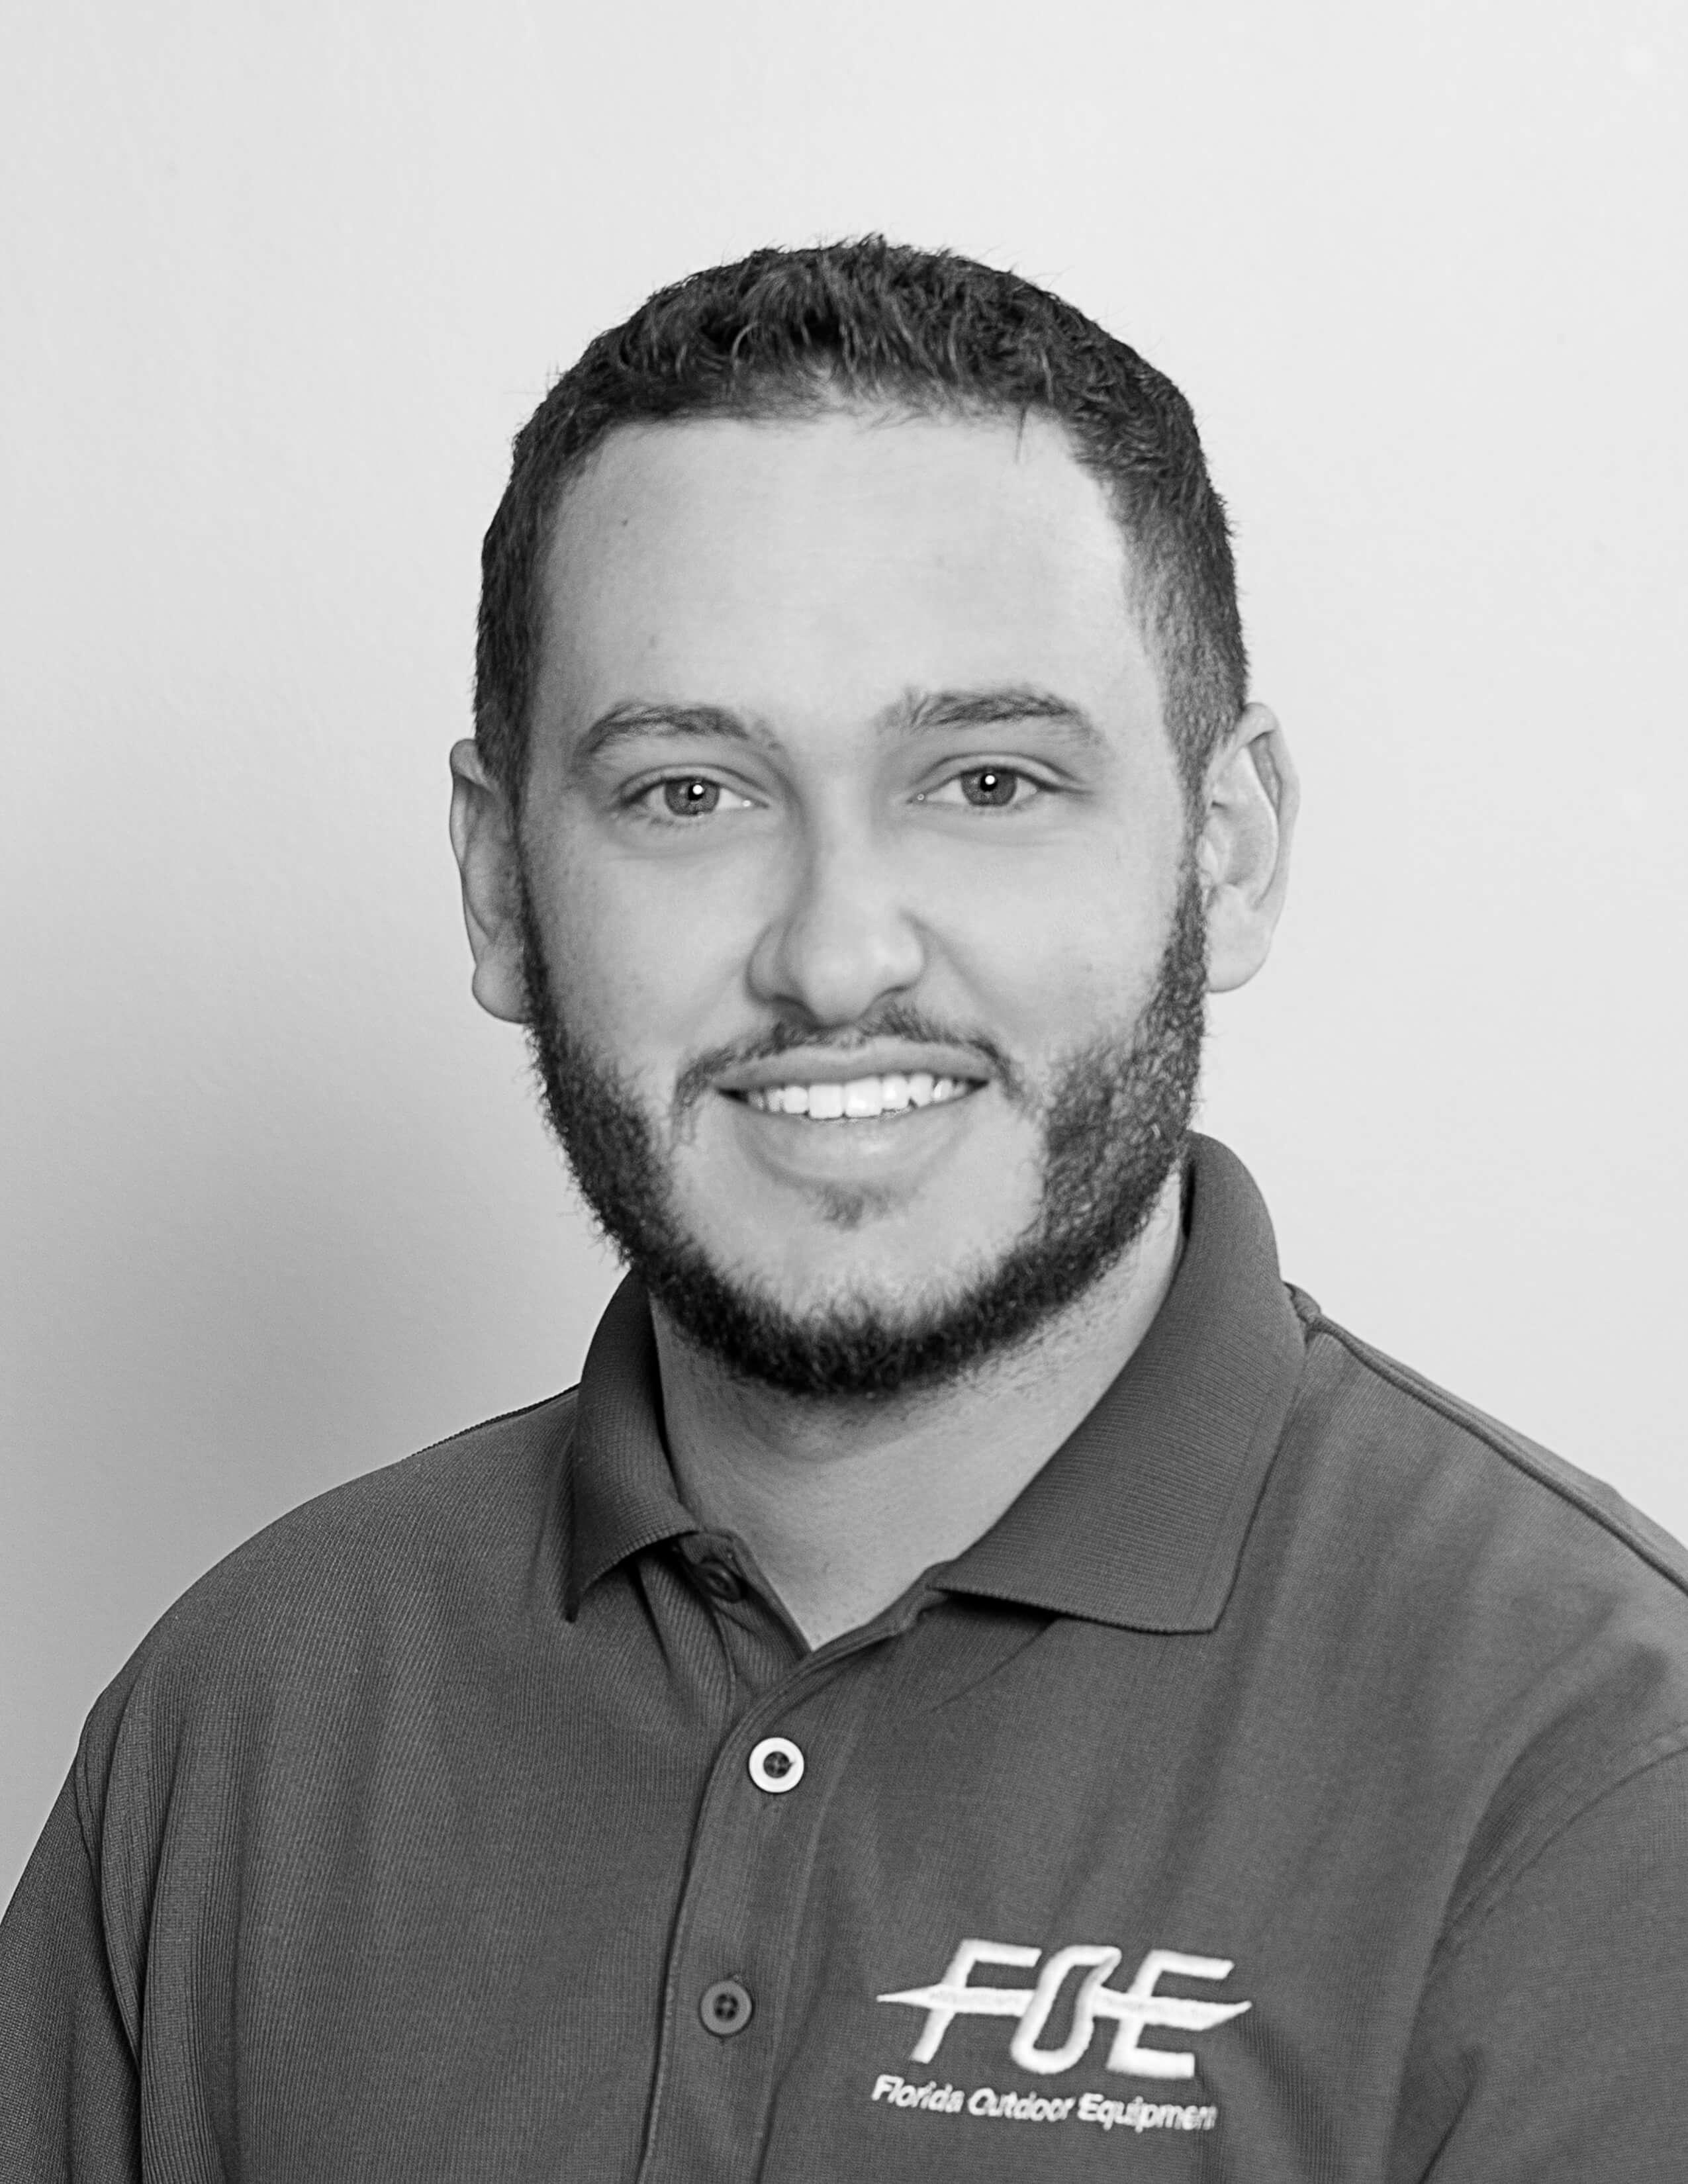 tyler brabham profile image